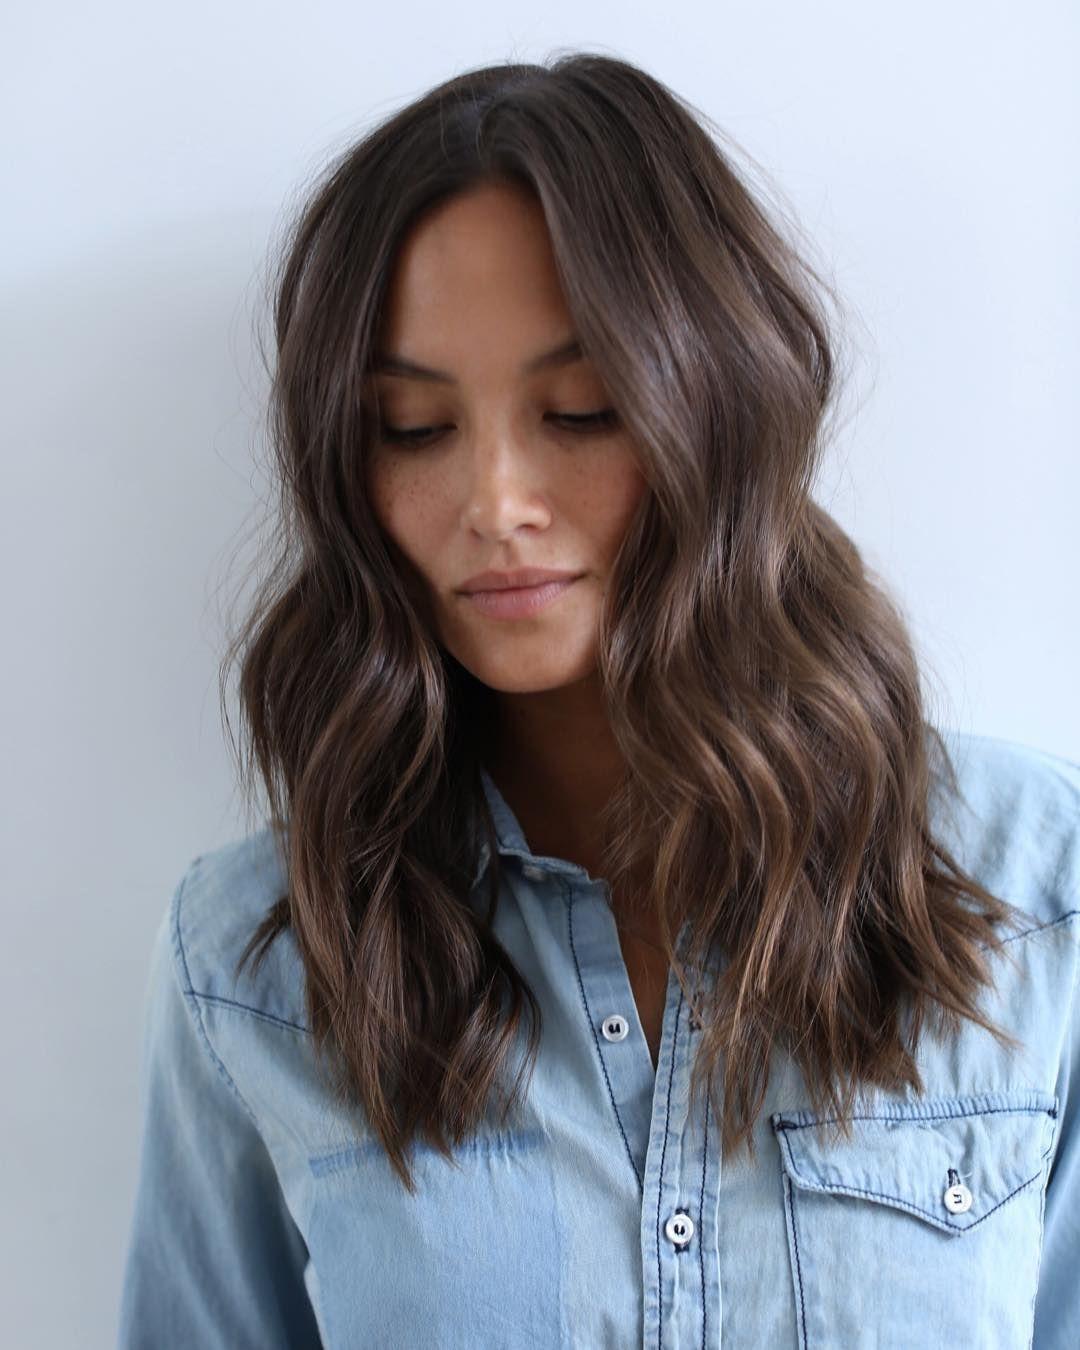 Love color and cut!!! LA Hair Stylist. ✈️NYC.SF.Chi.Mia. Lived In Hair™ Owner of Ramirez | Tran Salon: 310.724.8167 & :info@ramireztran.com. Agency: @traceymattinglyllc